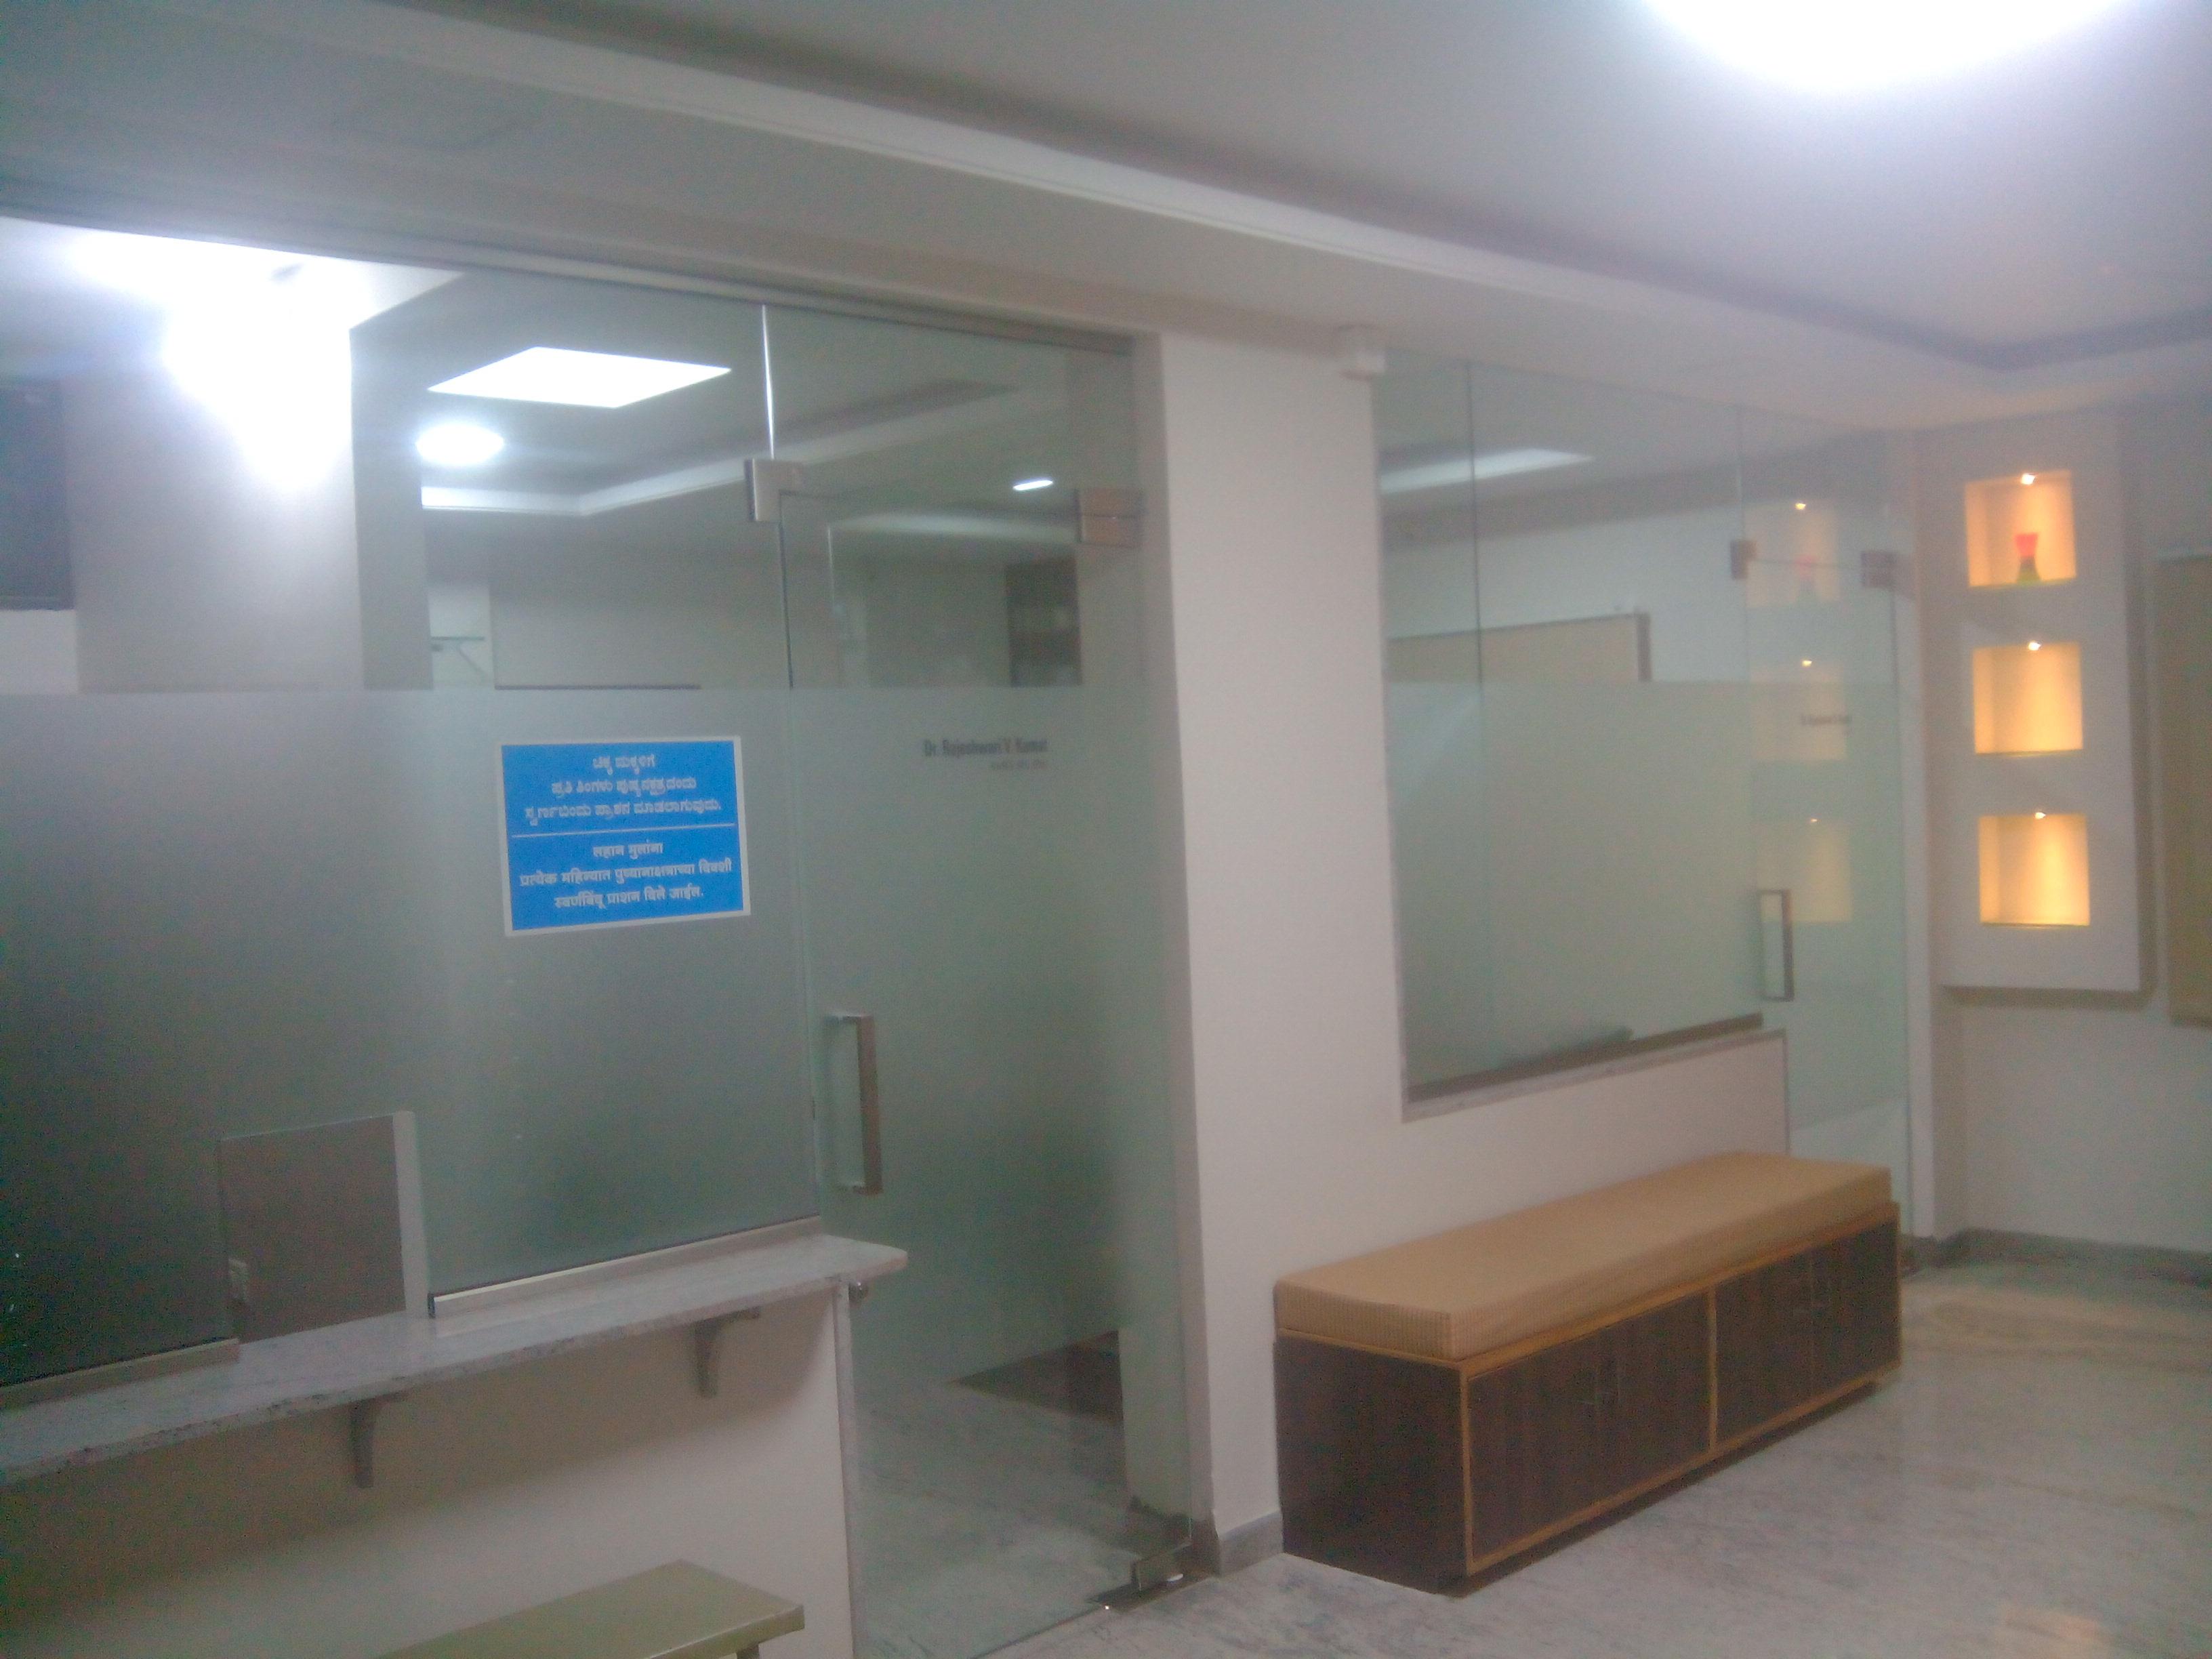 Dr Kamats Ayurvedic Clinic - Ayurvedic Medicine Clinic in city